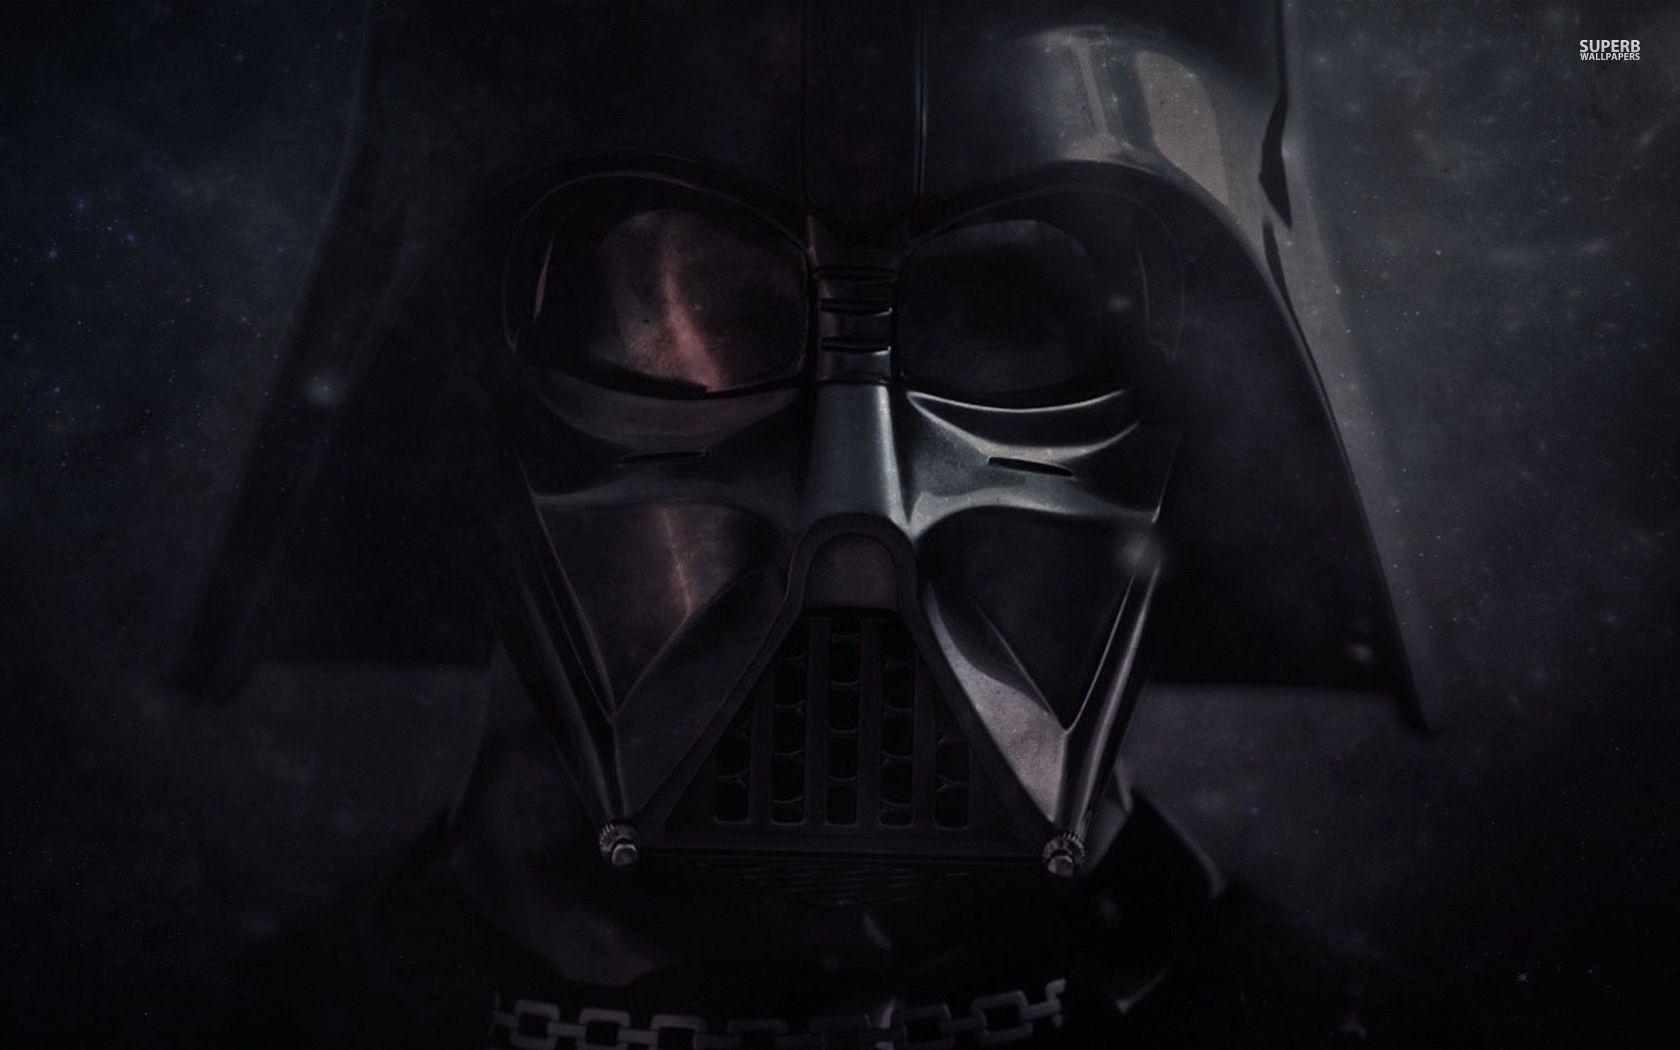 Free Download Darth Vader Wallpaper 1680x1050 55682 1680x1050